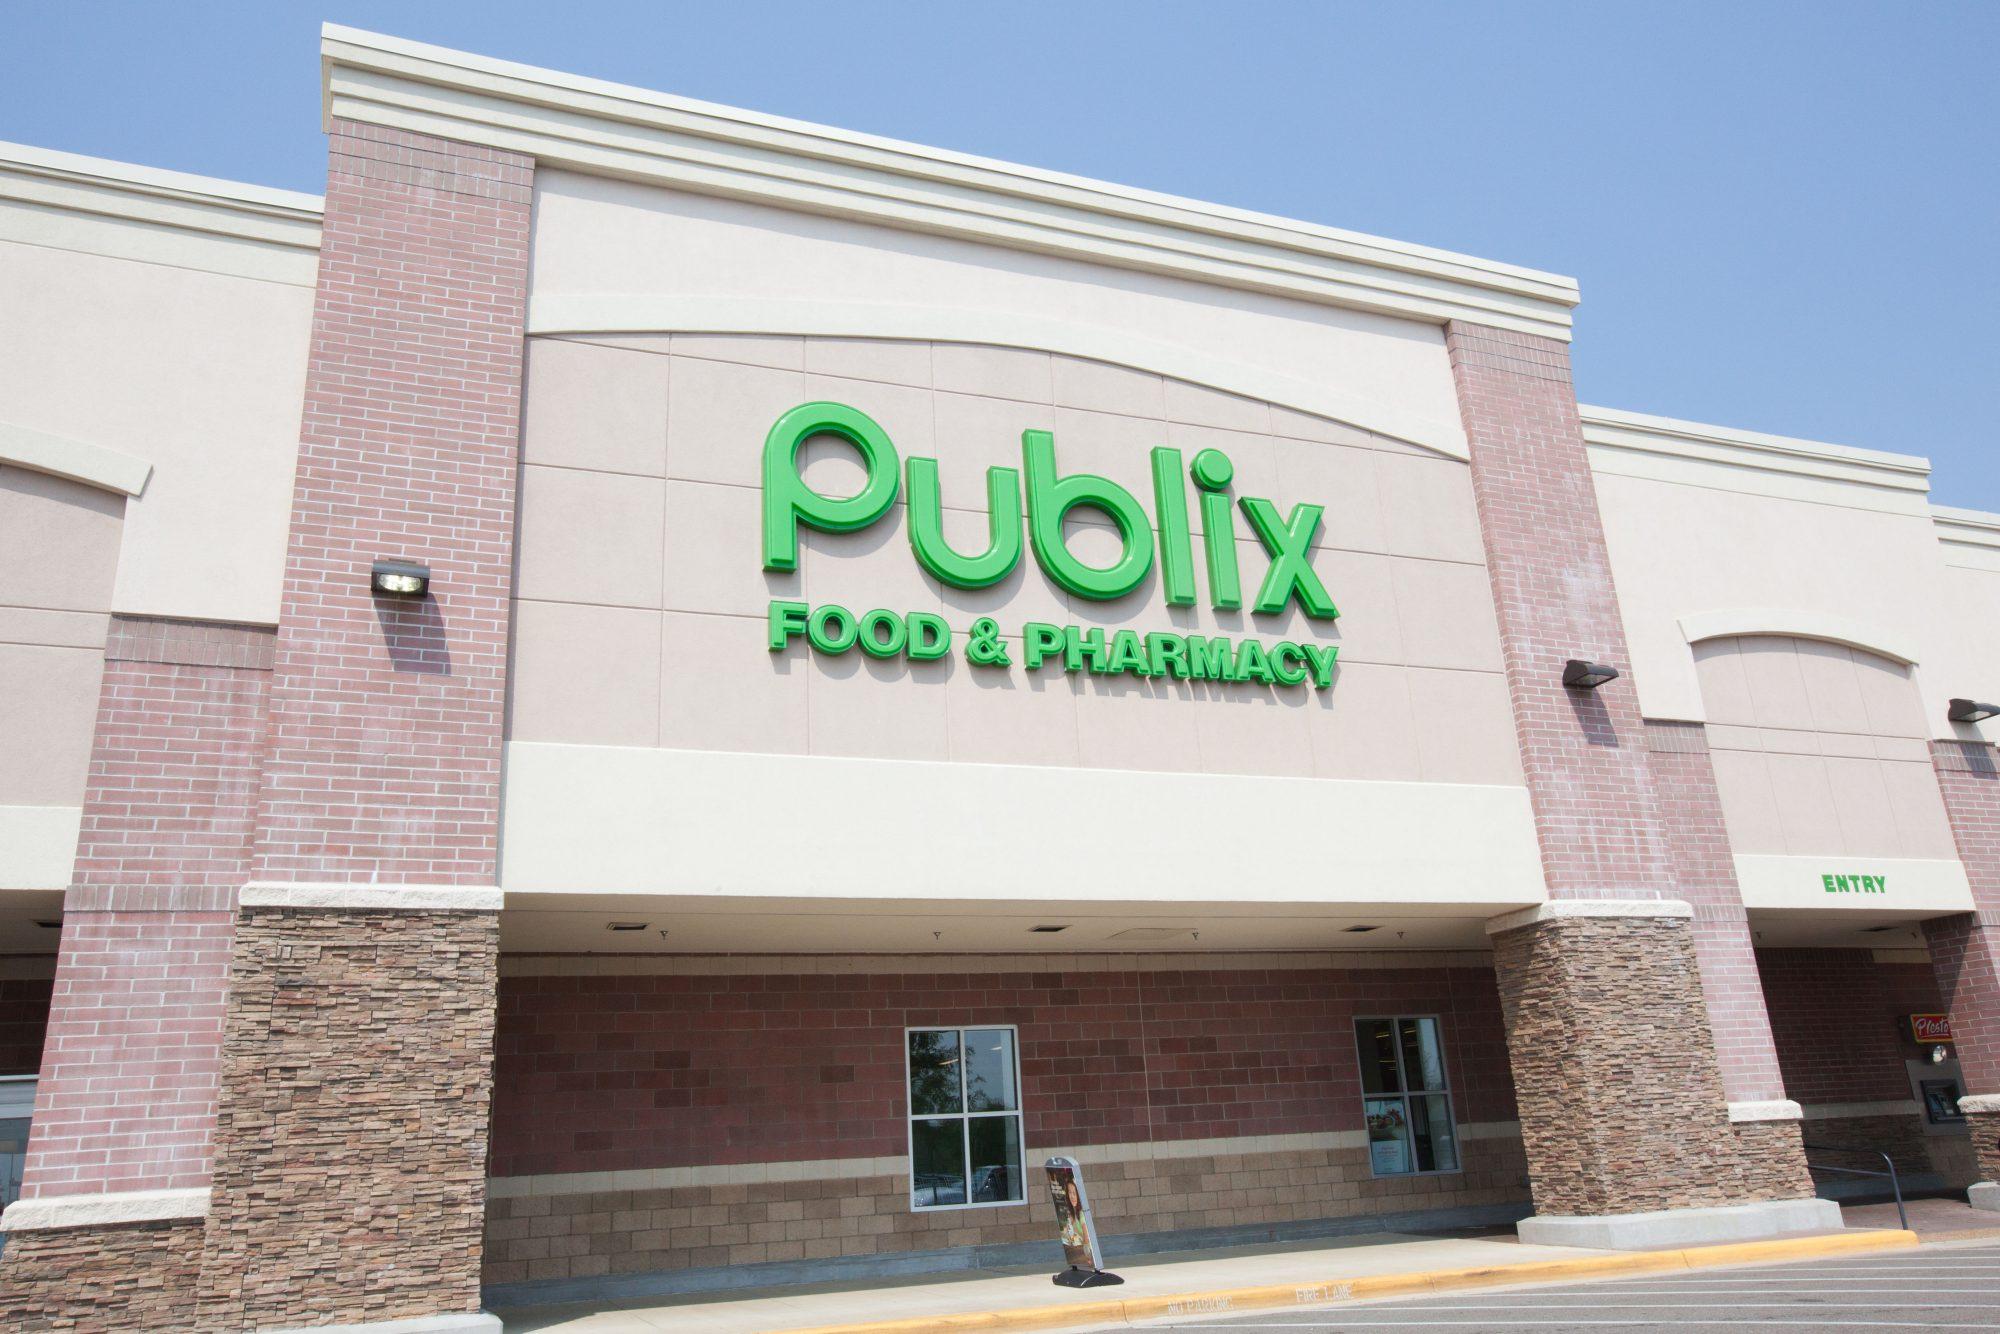 The Secret to Finding the Best Deals at Publix